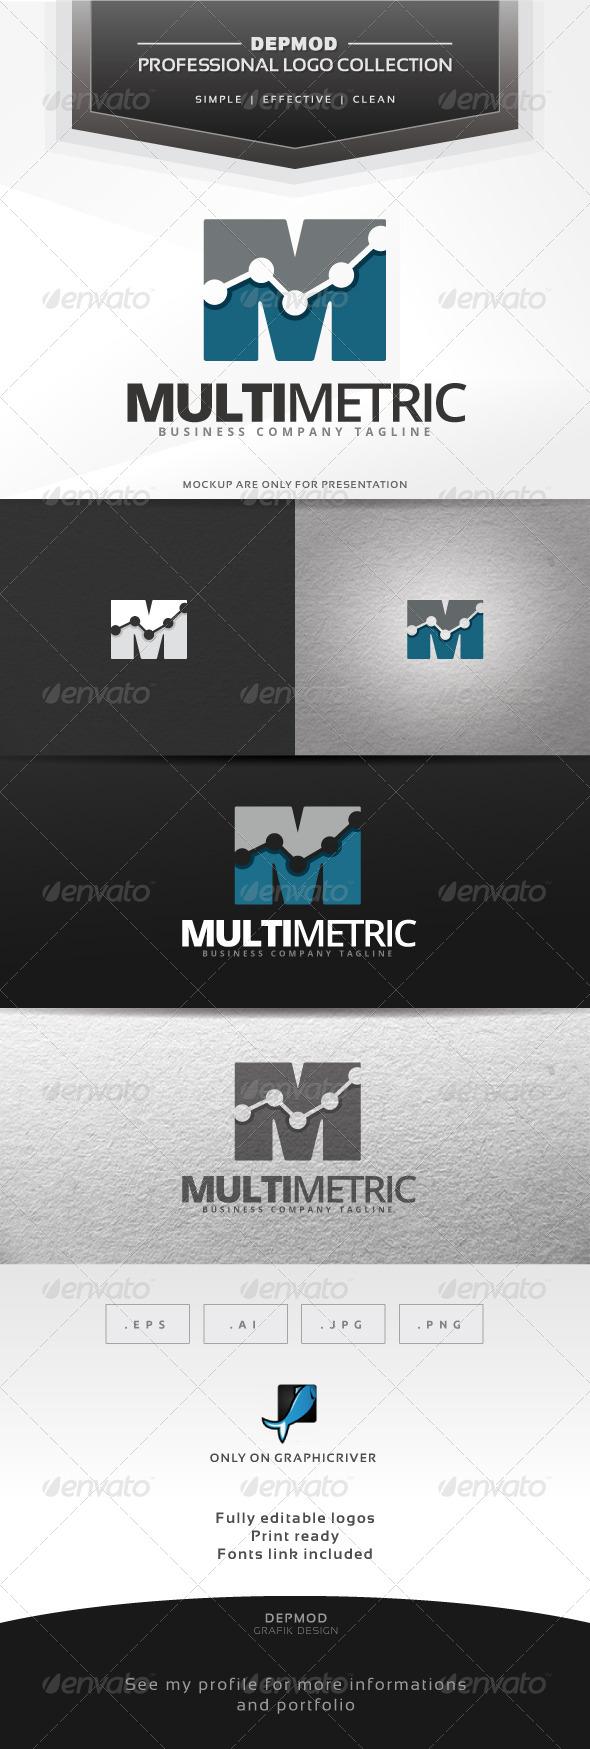 Multi Metric Logo